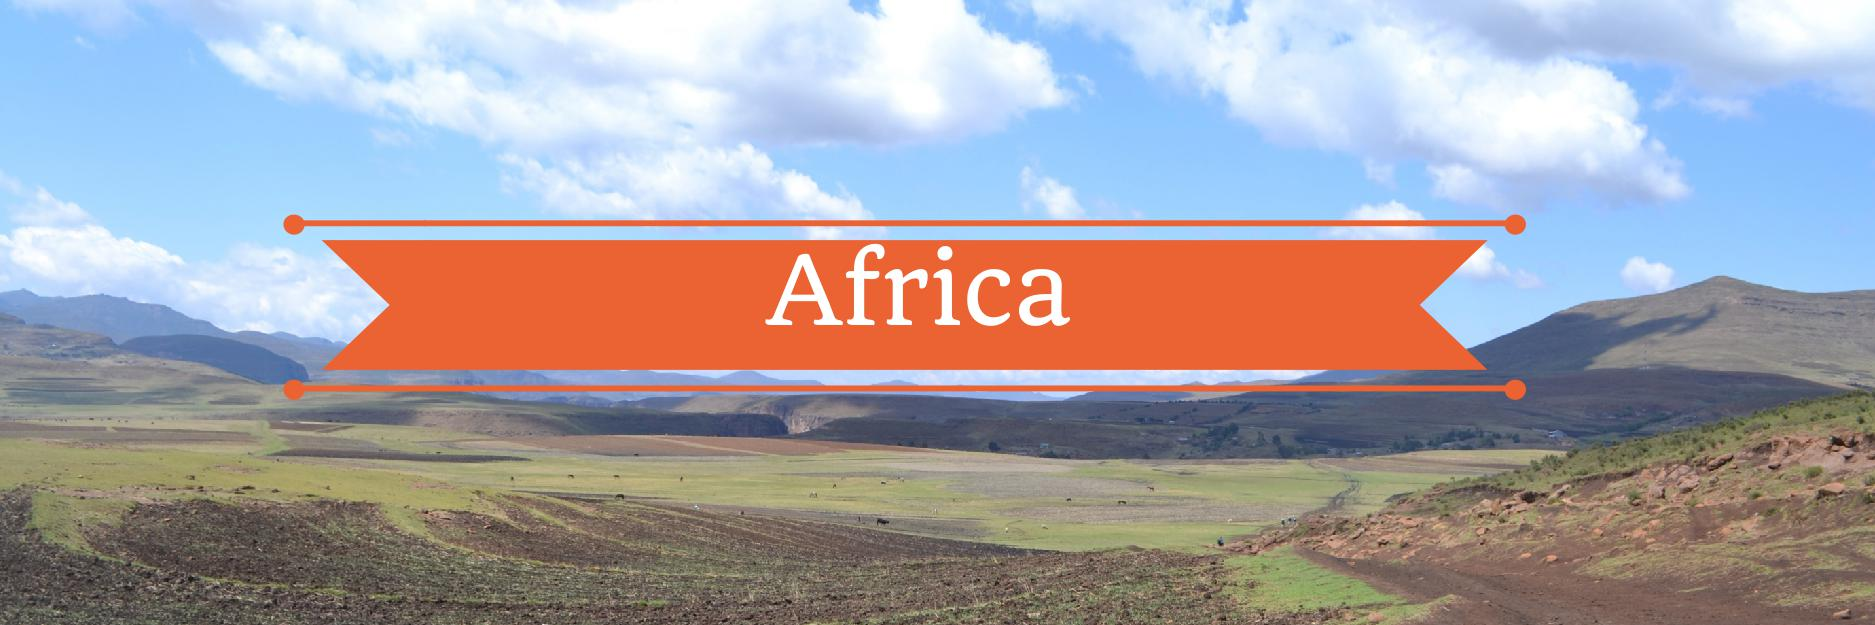 Africa Banner